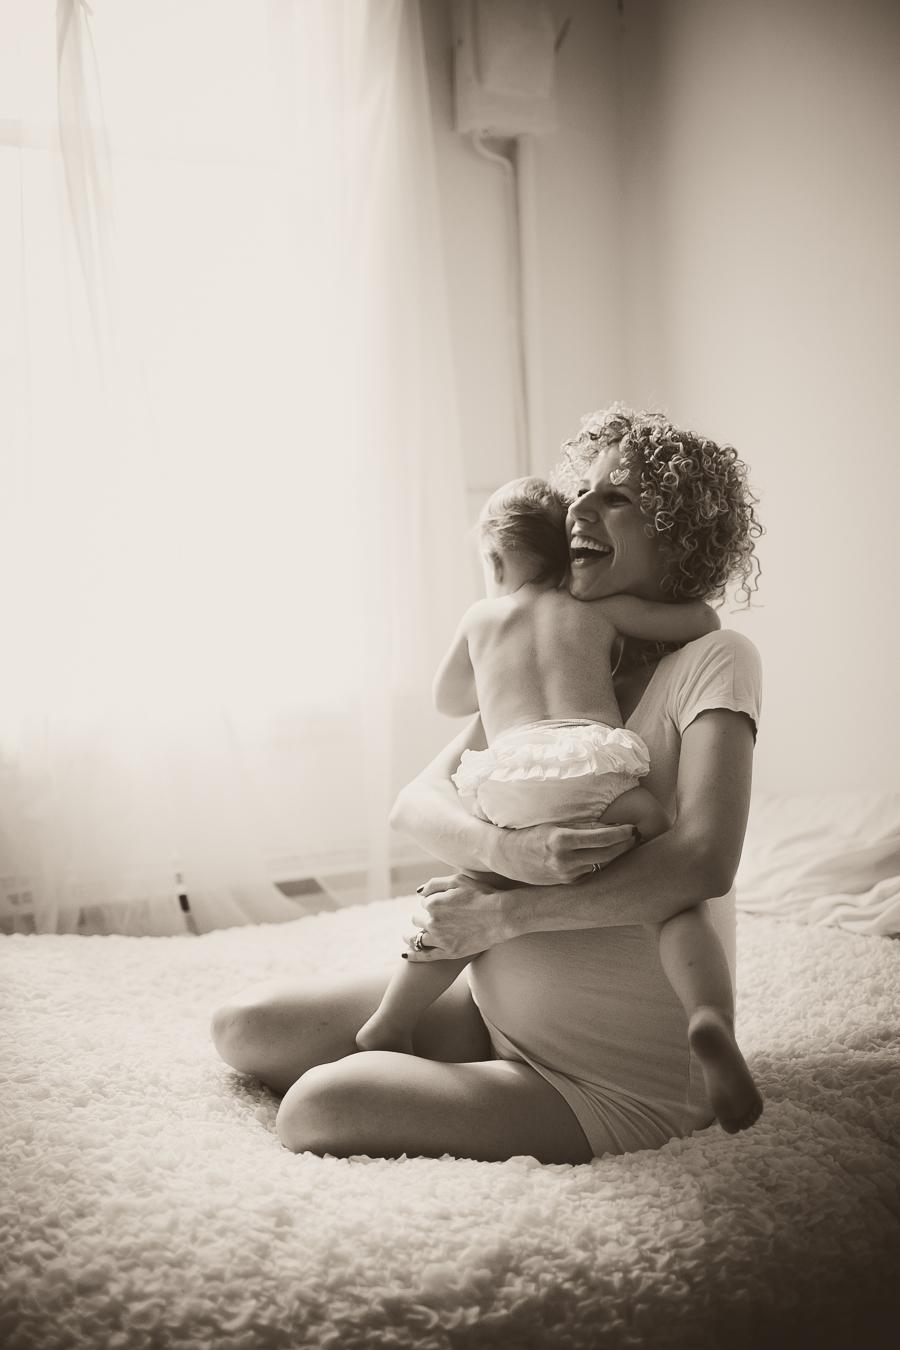 peterborough photographer, peterborough ontario portrait photographer, peterborough maternity photographer, peterborough newborn photographer, maternity photography, newborn photography